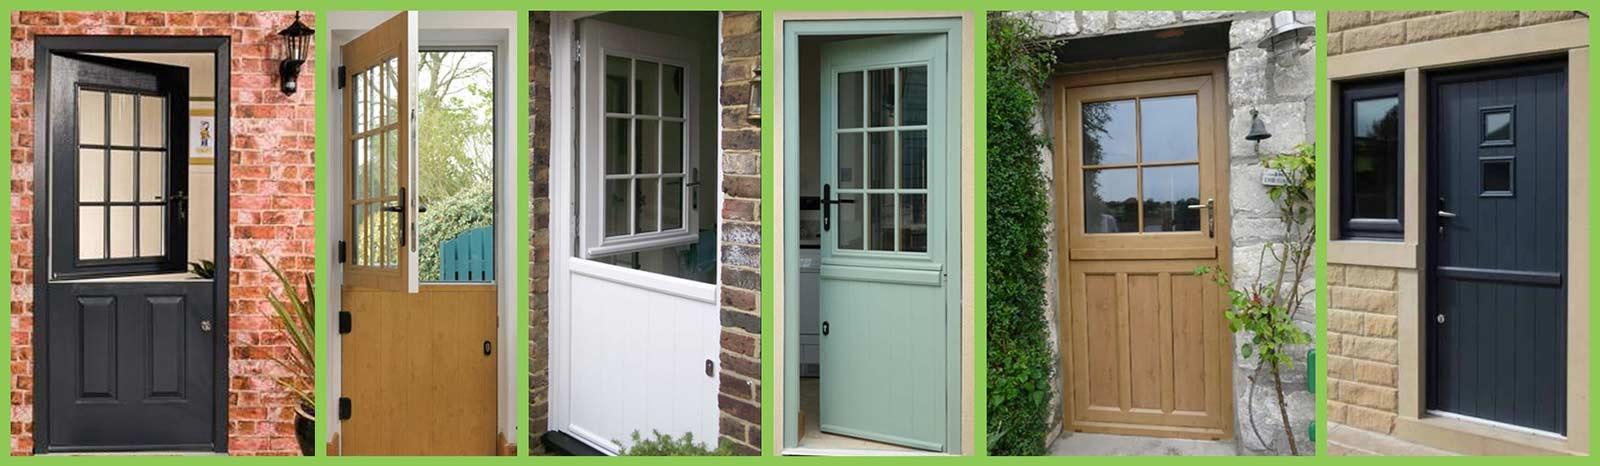 Southgate Windows Trade Upvc Stable Doors Bridgwater